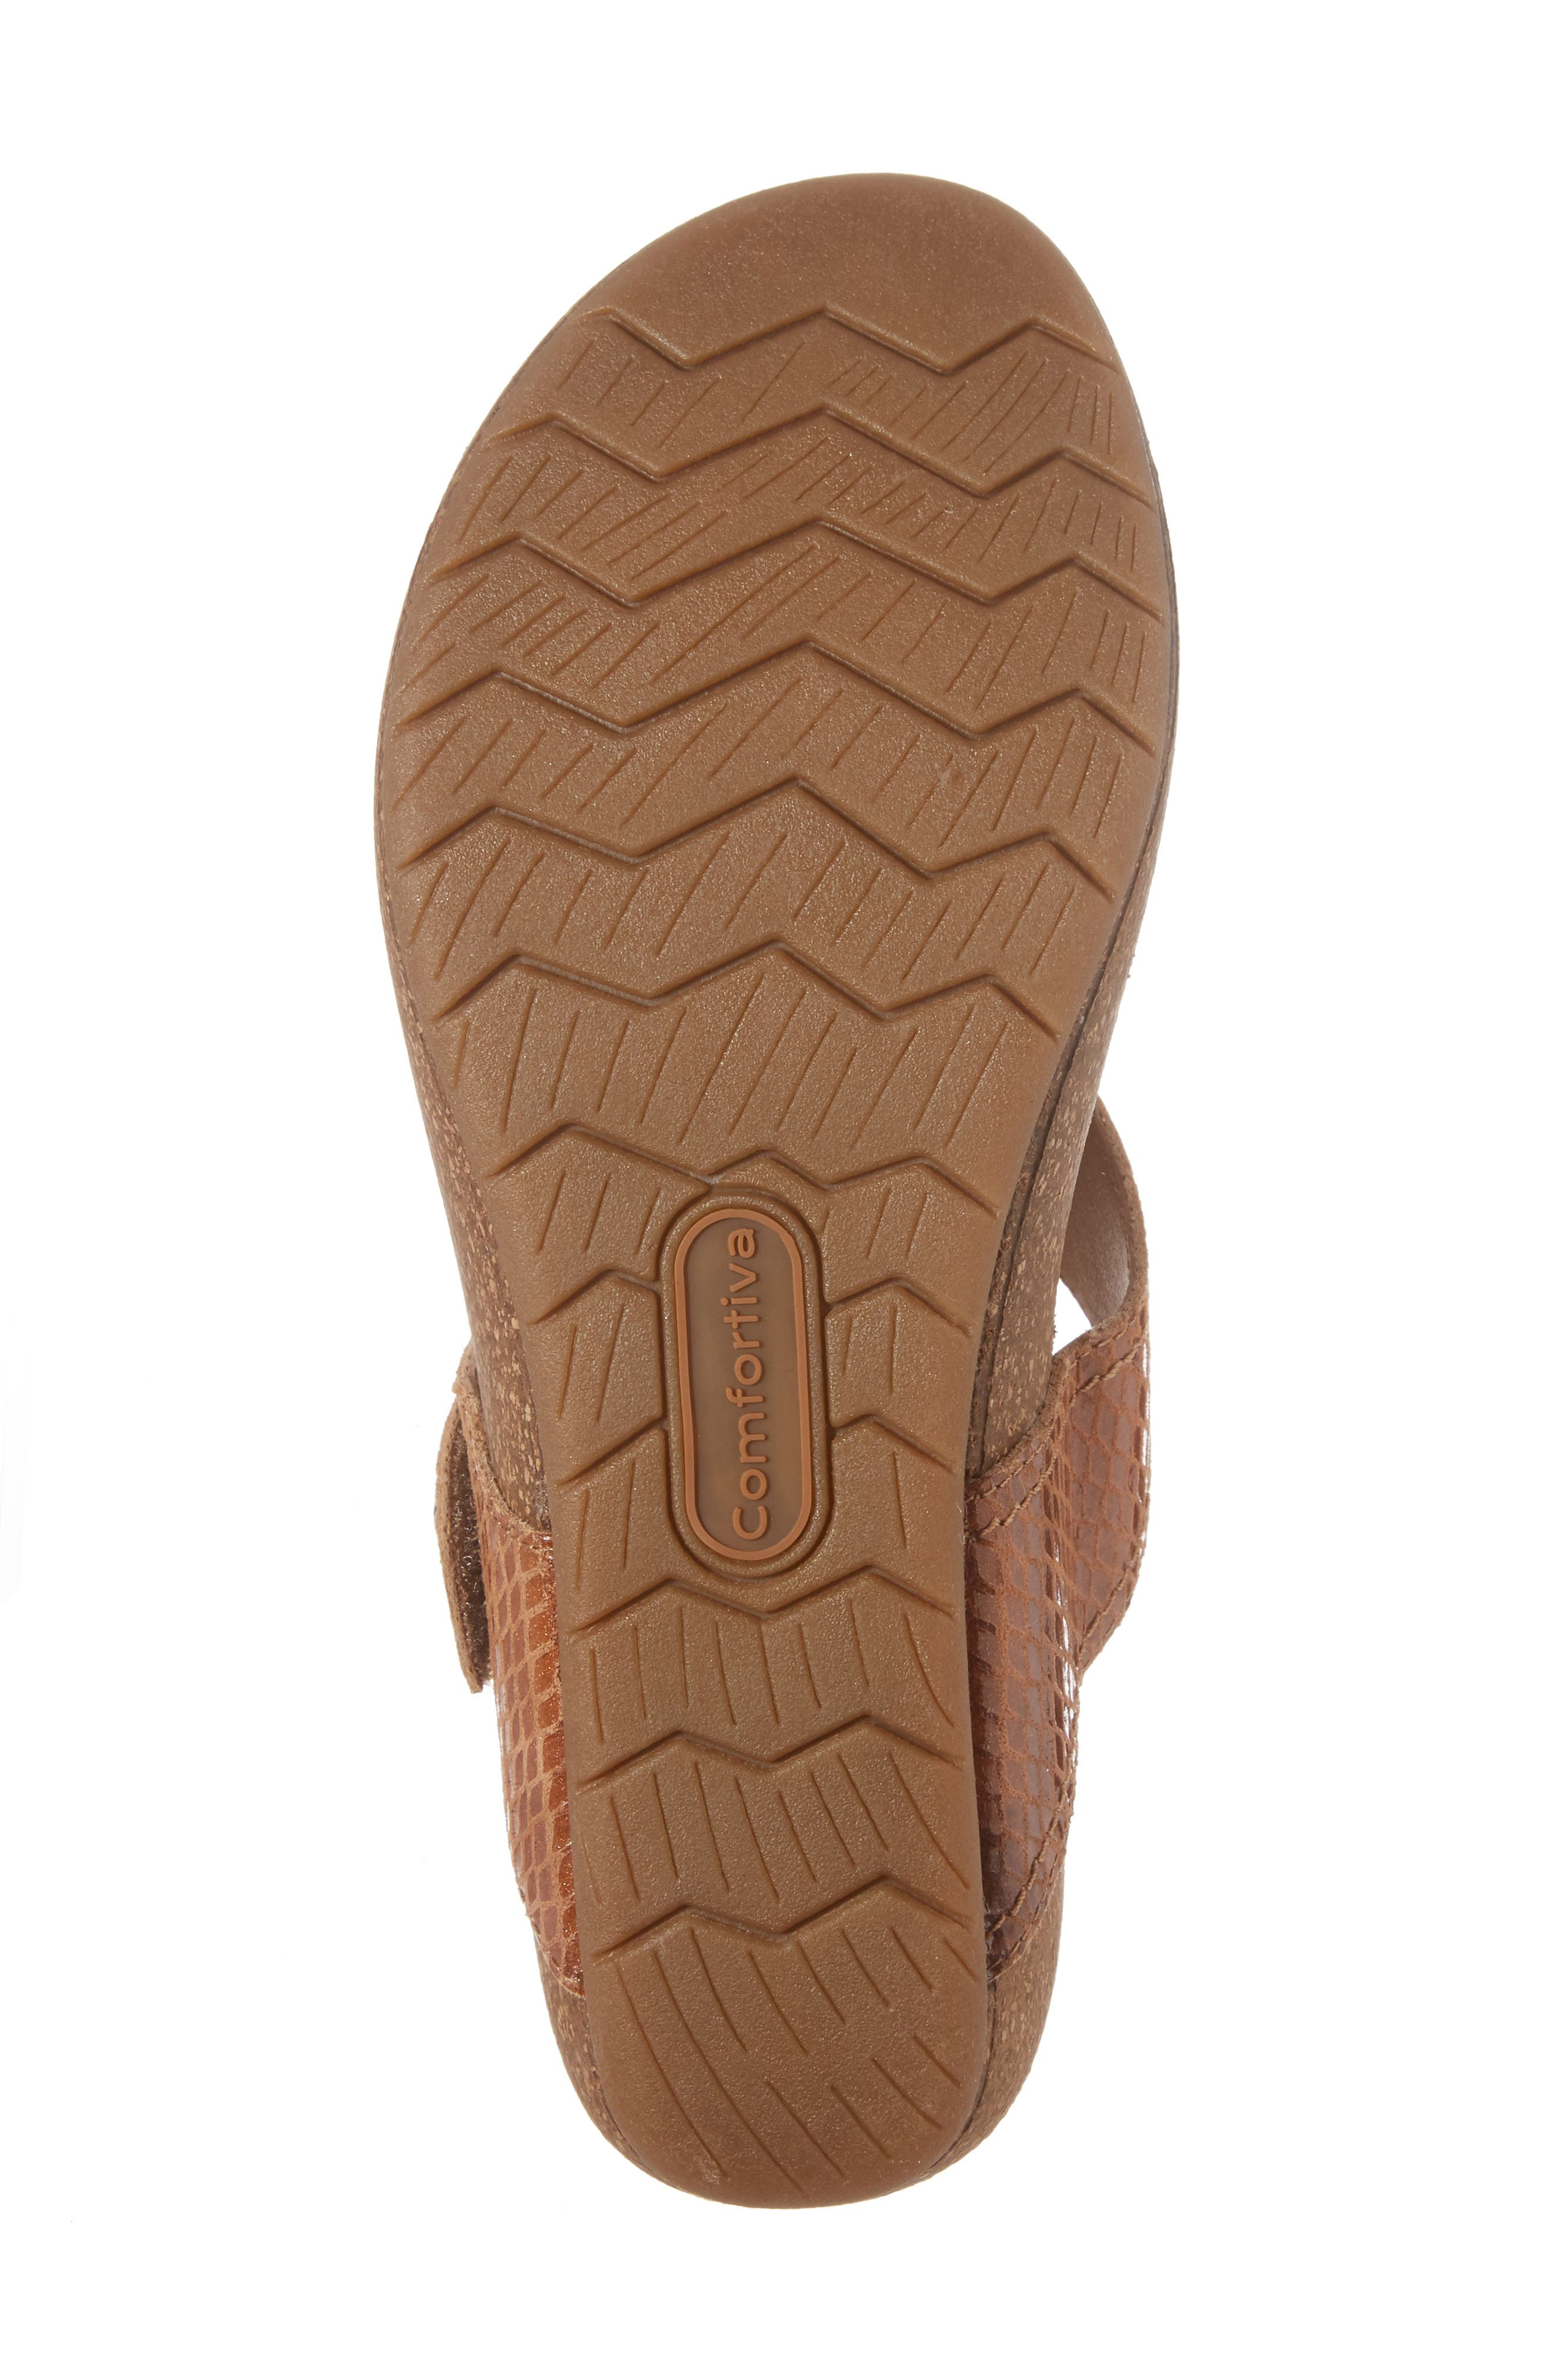 Shantel Flip Flop,                             Alternate thumbnail 6, color,                             Luggage Print Leather